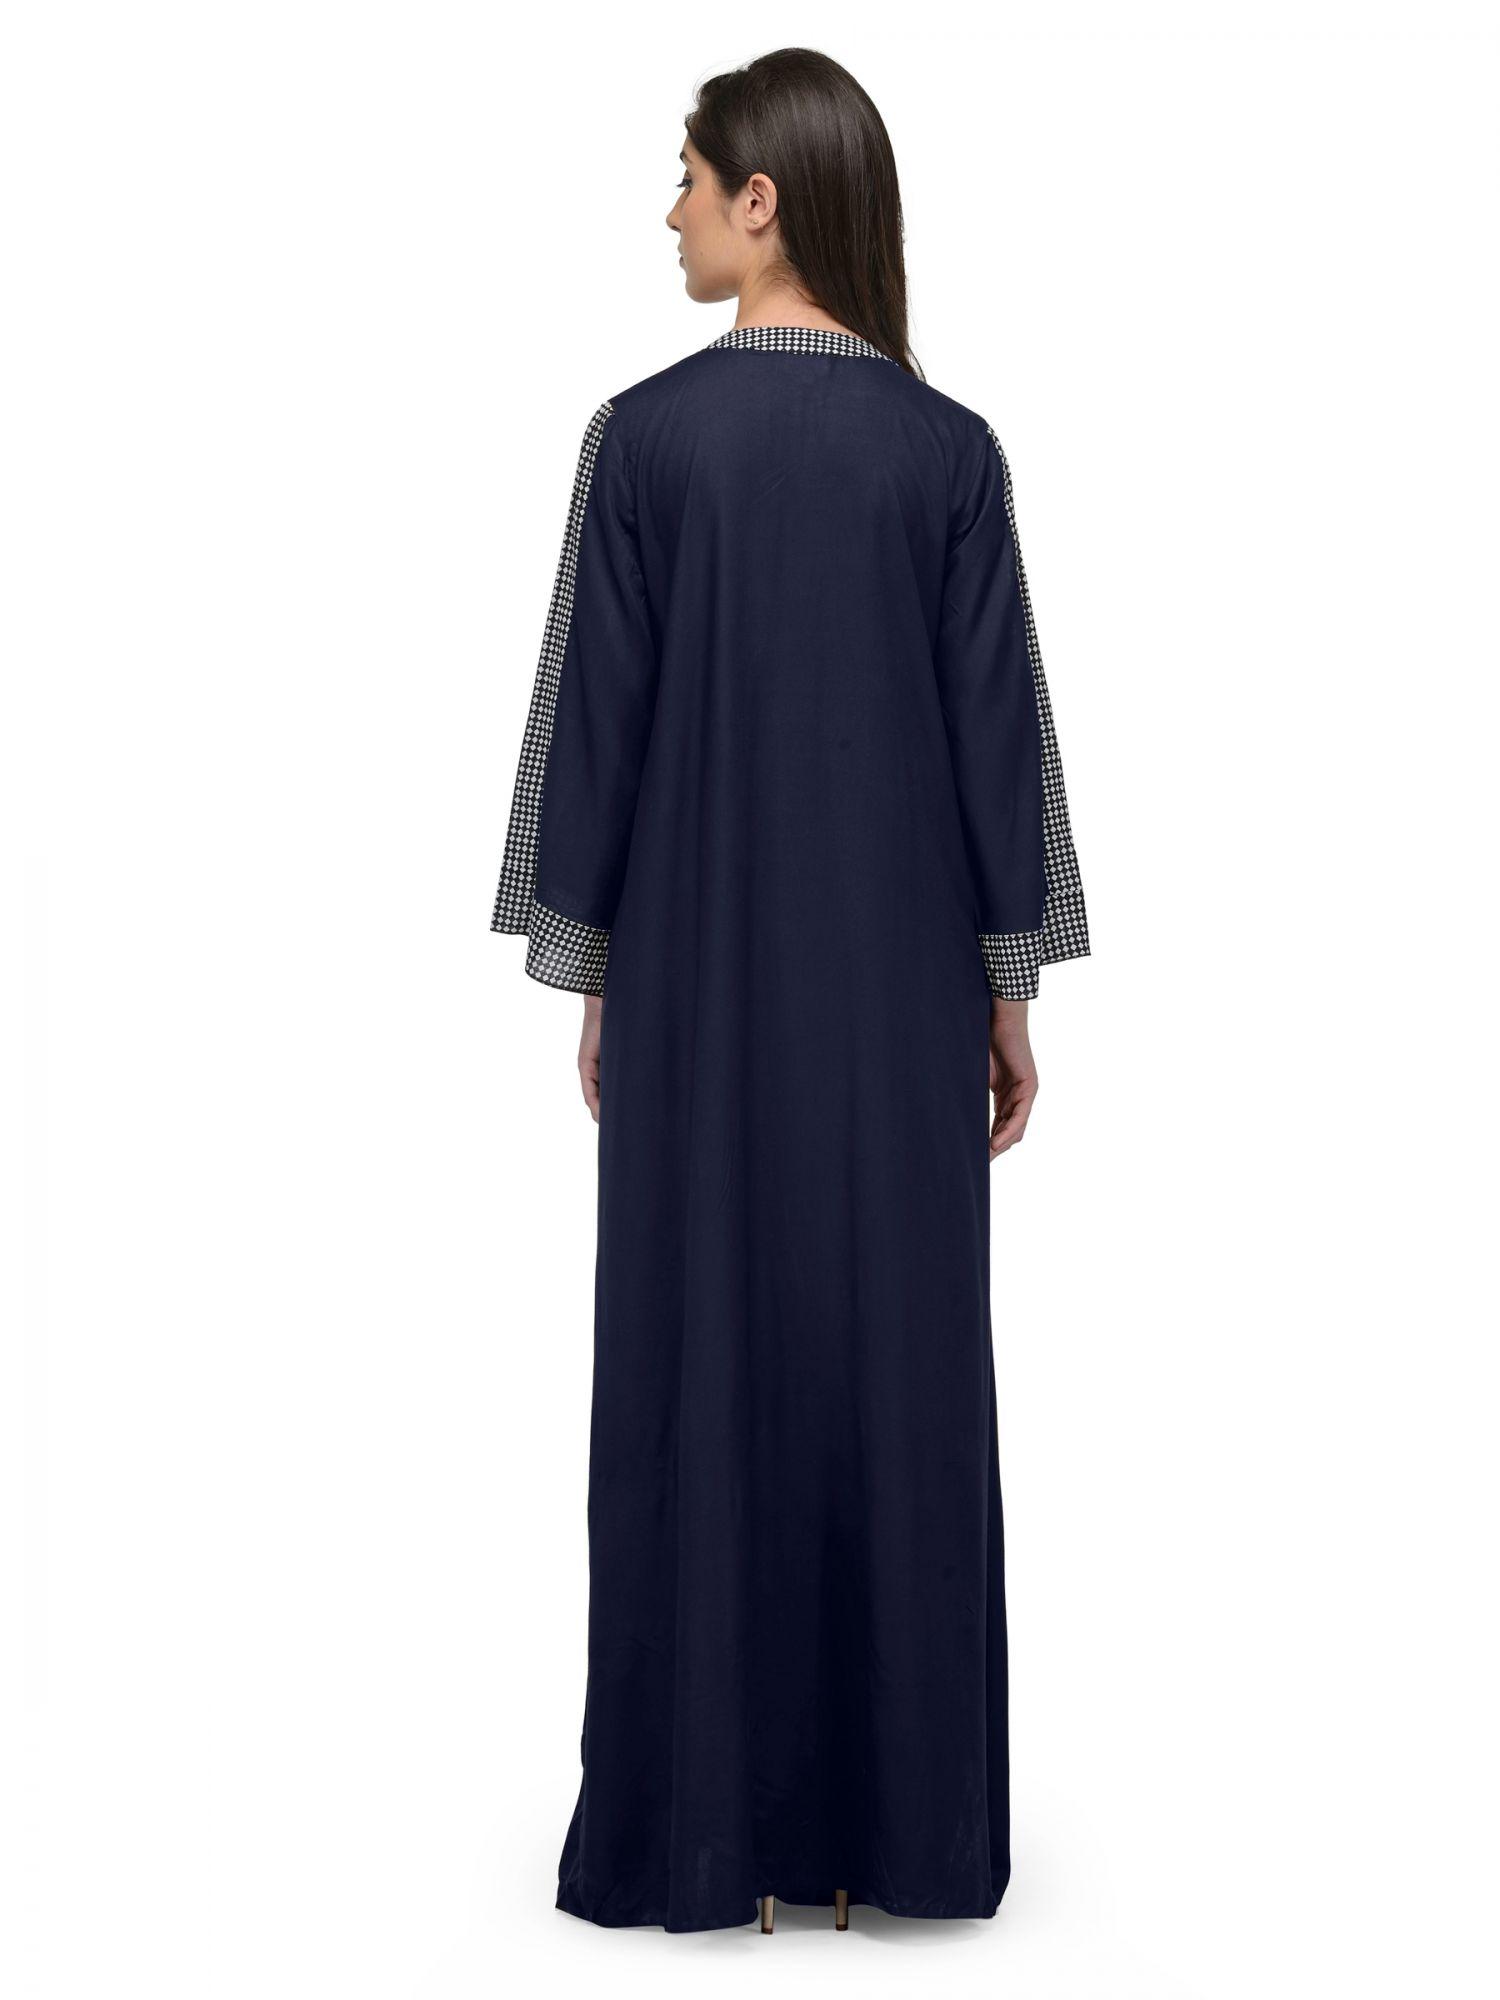 Loose Cut Wrap Nighty Nightgown in Dark Blue